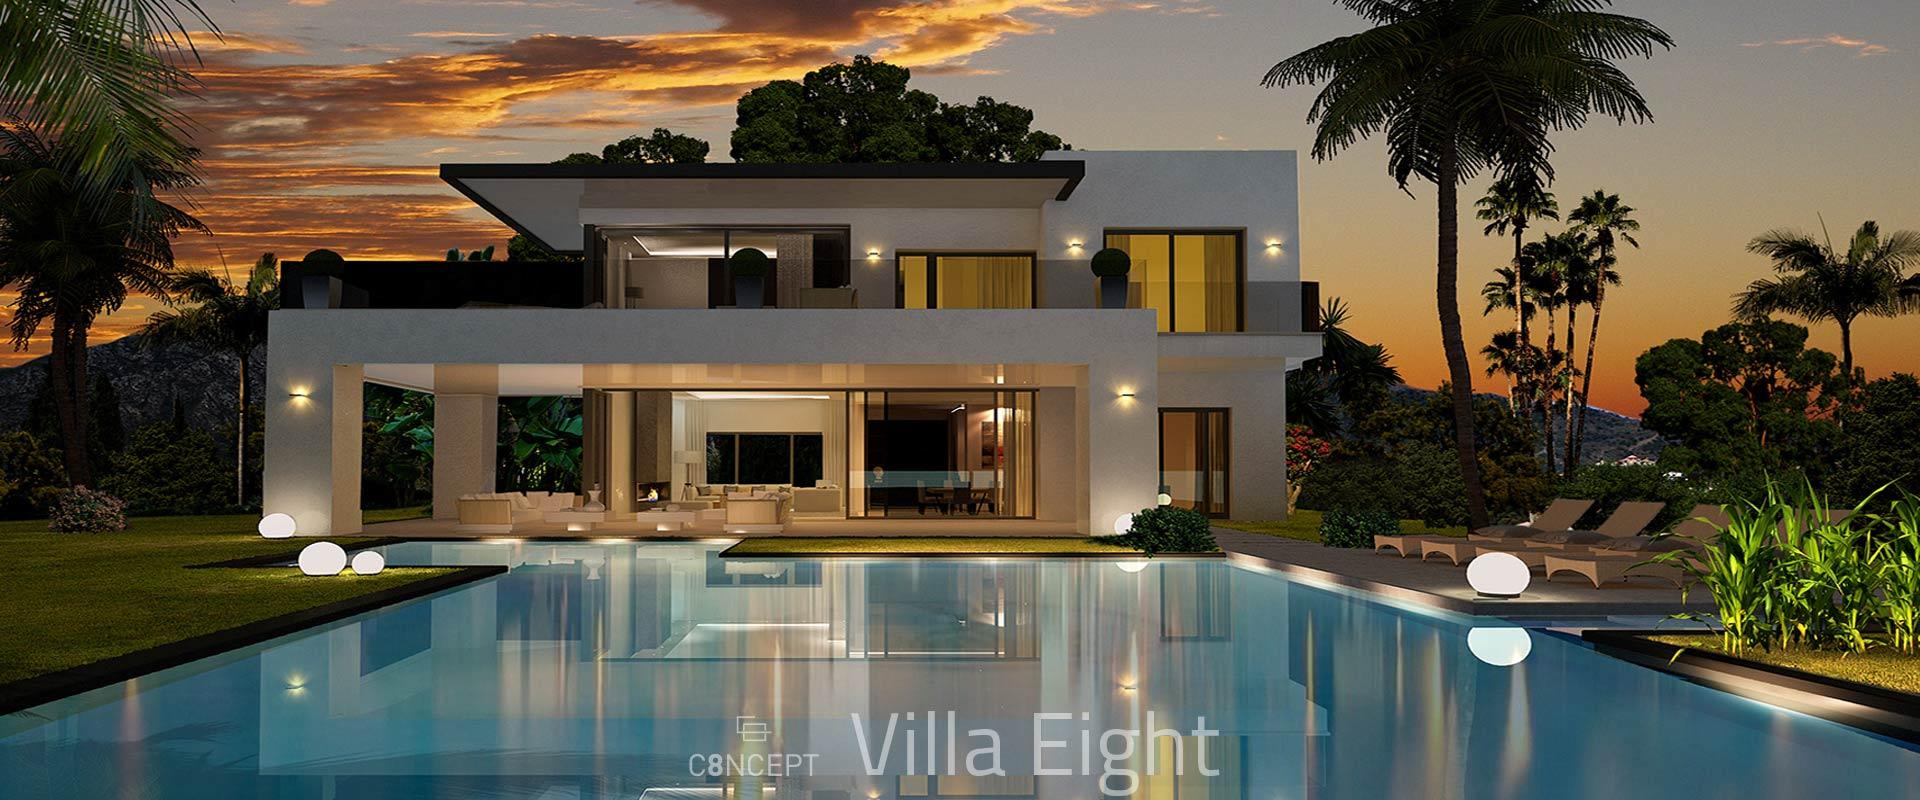 Golden Mile Marbella Small Gated Villa Community Offplan